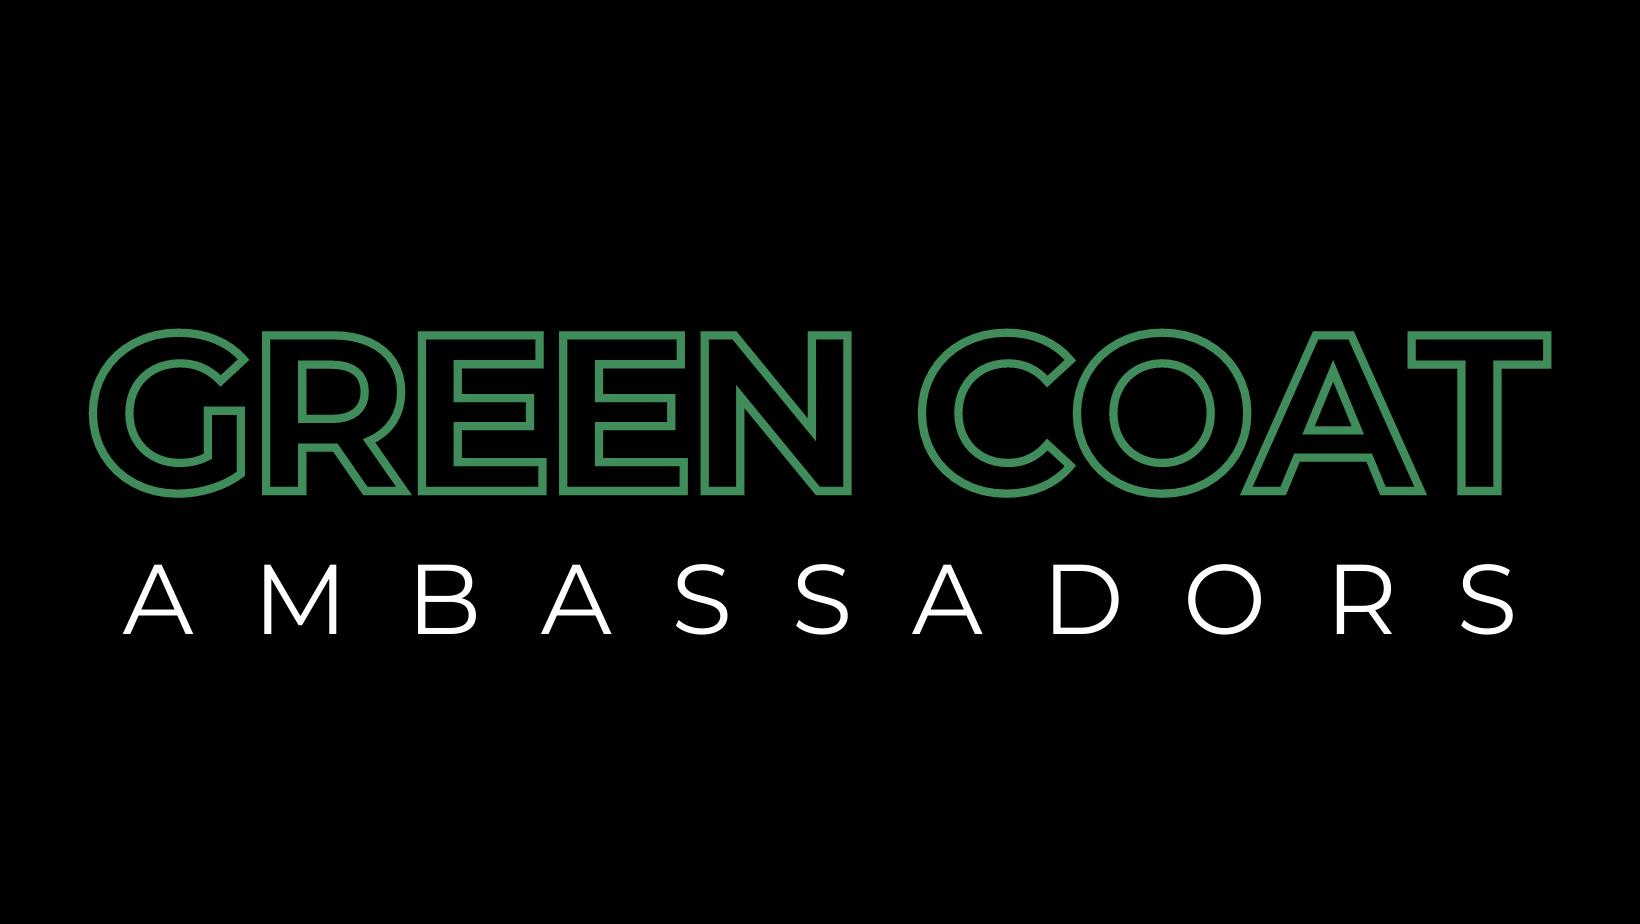 CURRENT-2021-Green-Coat-Banner-.png